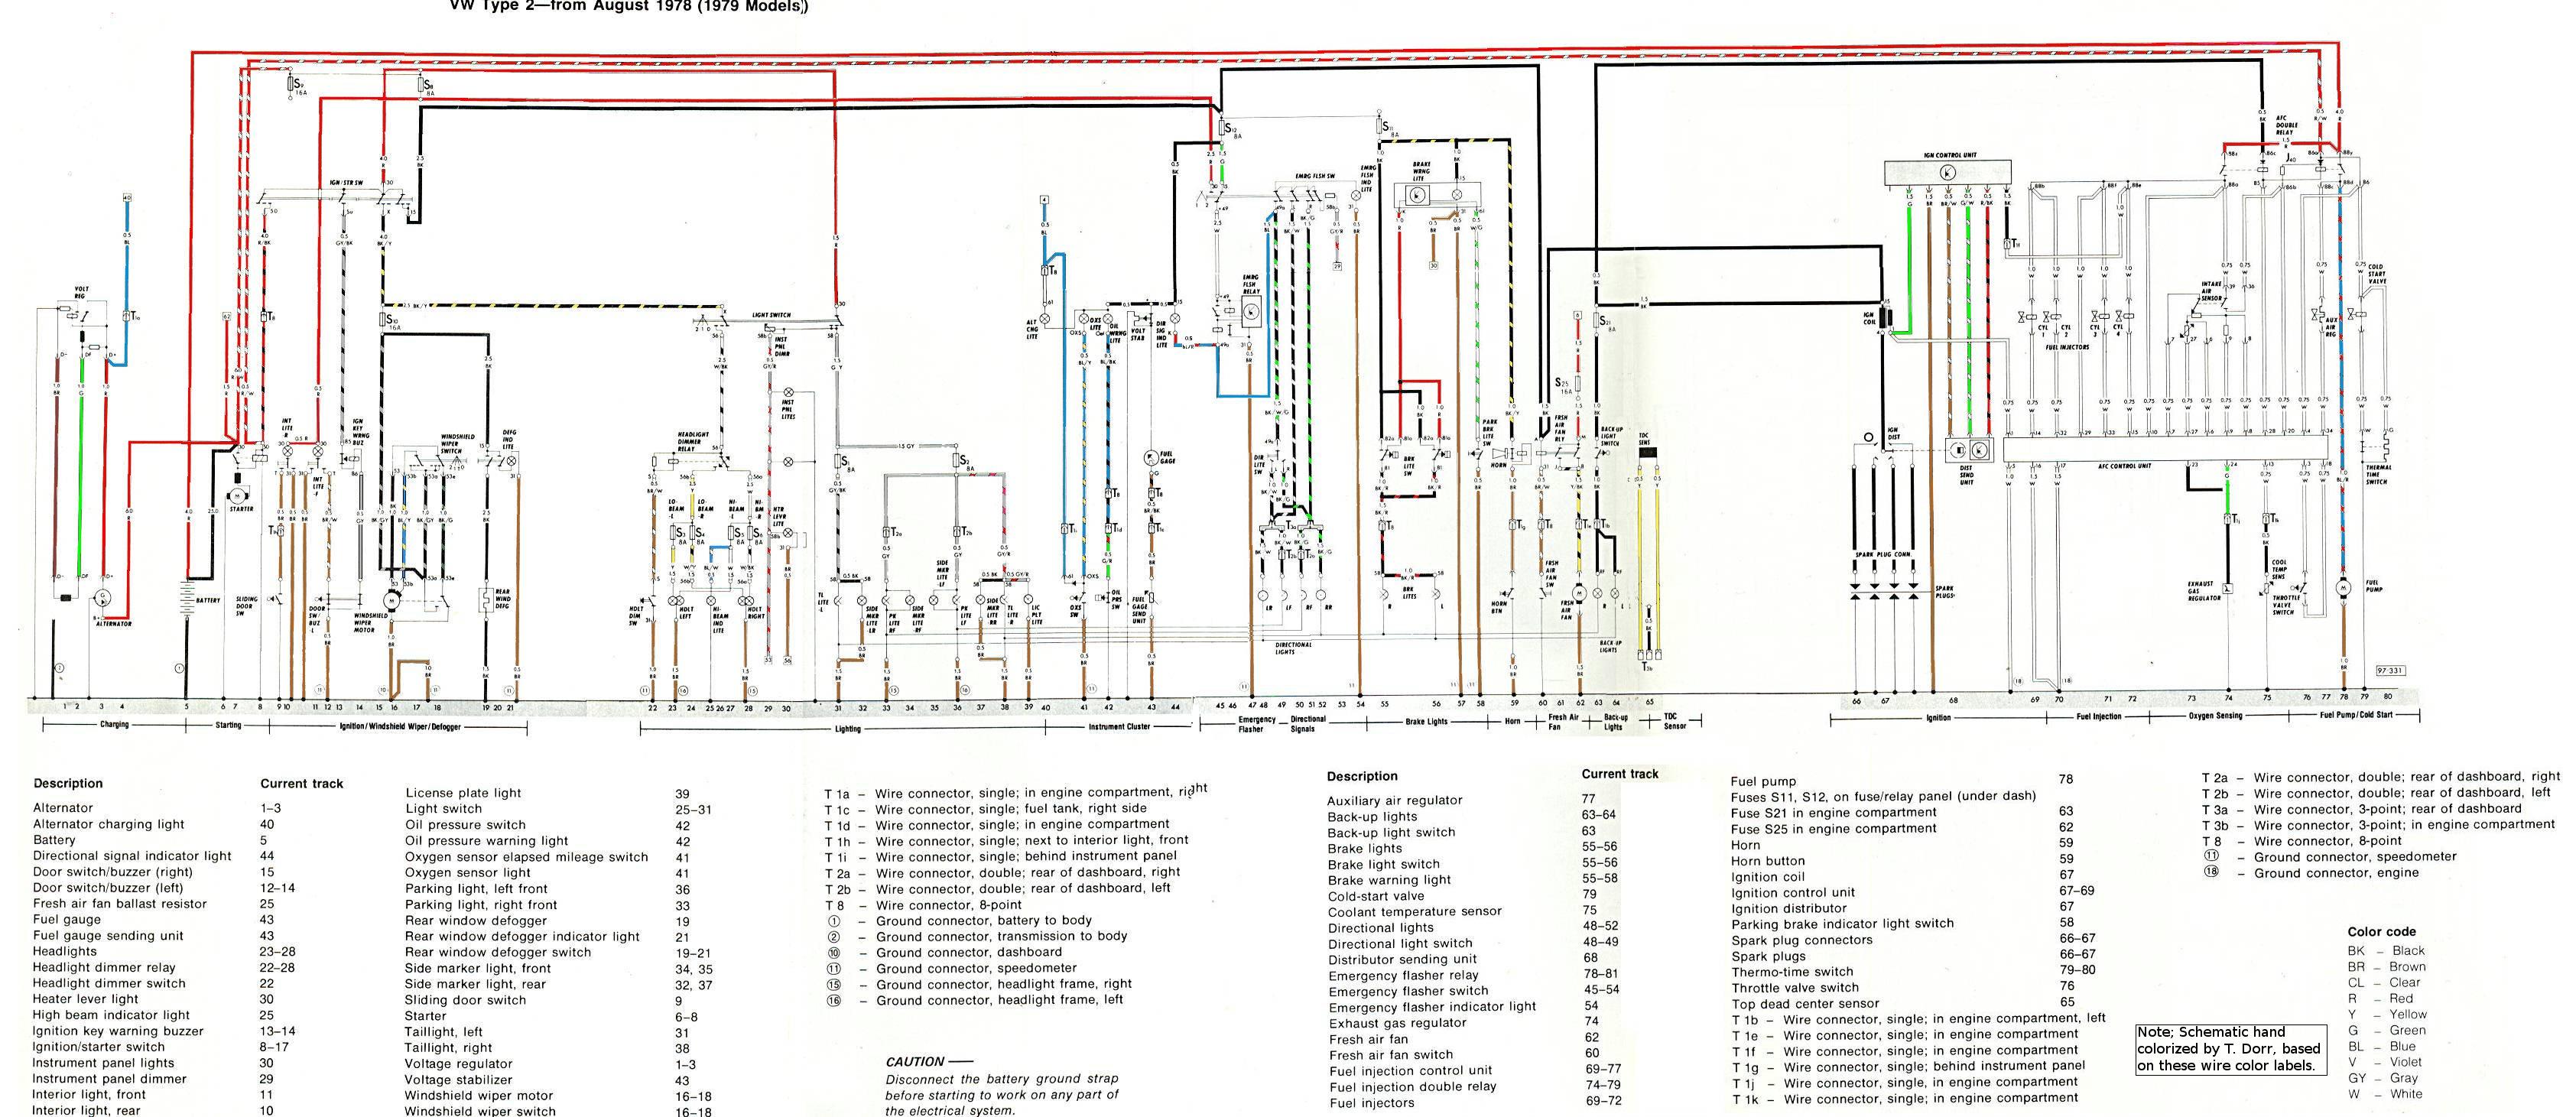 911sc fuse box diagram collection of wiring diagram u2022 rh saiads co GMC Fuse Box Diagrams 1983 porsche 911 sc fuse box diagram